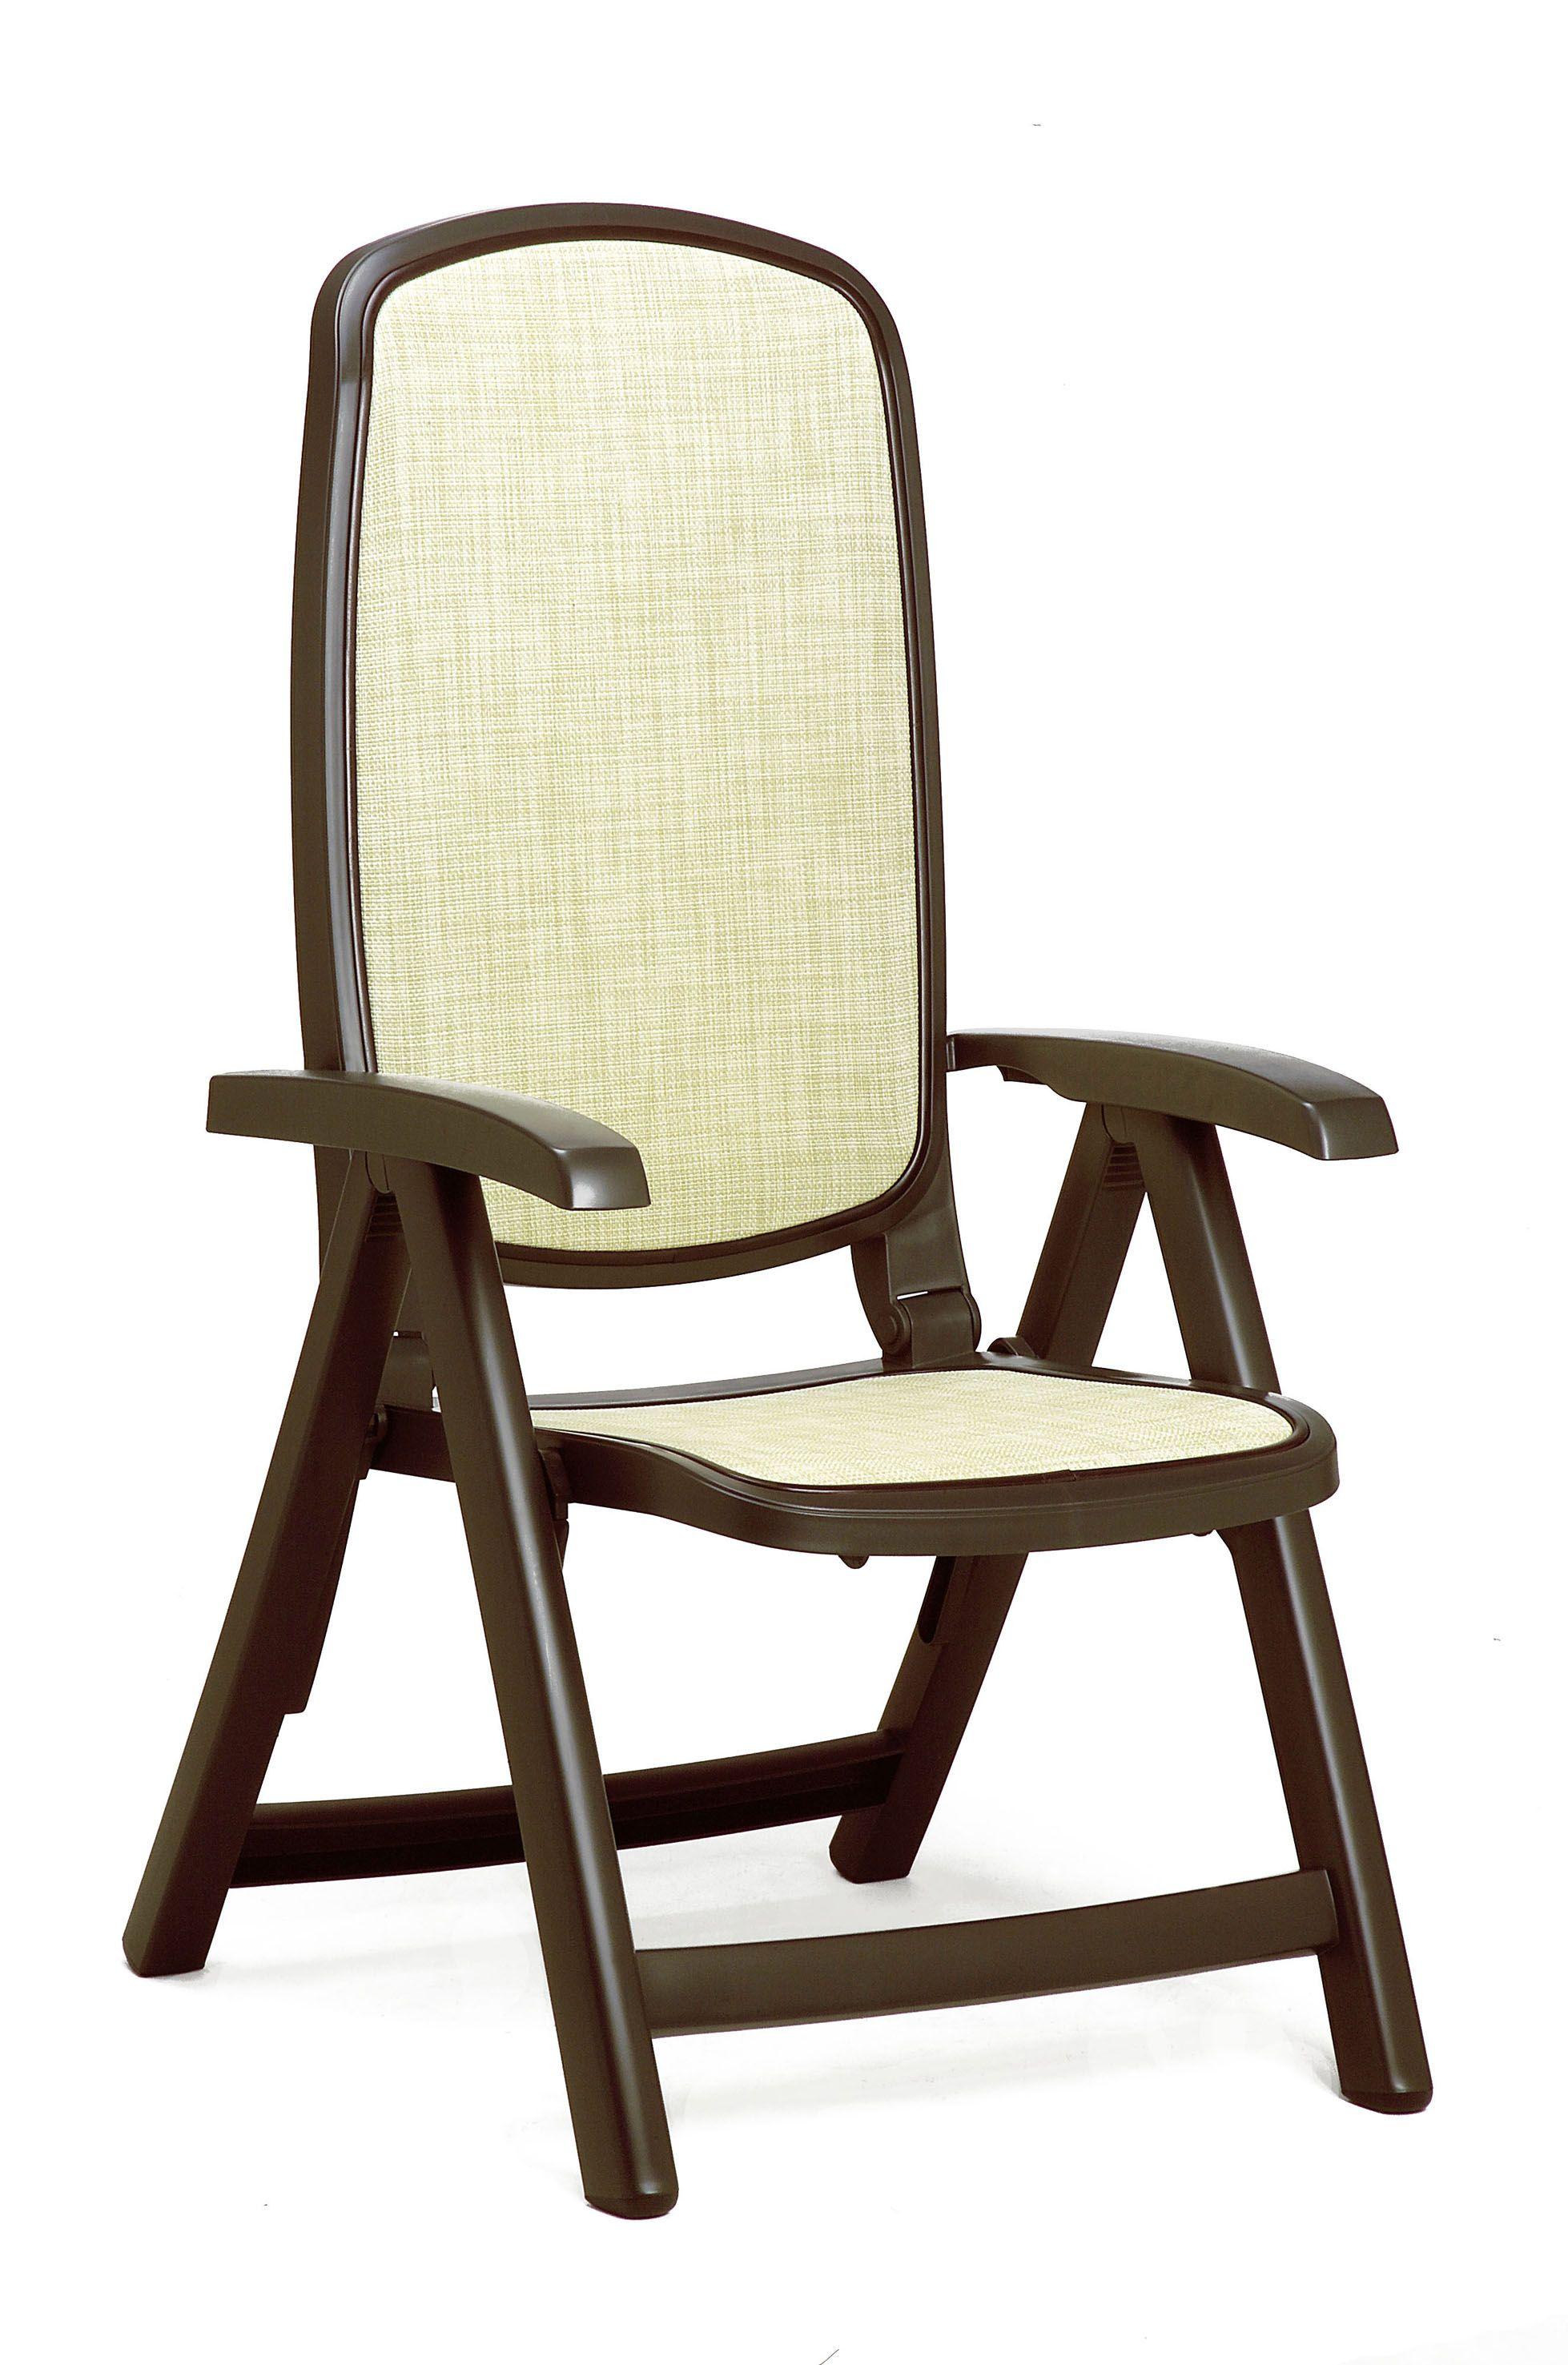 Nardi Delta Resin Sling 5 Position Folding Patio Chair